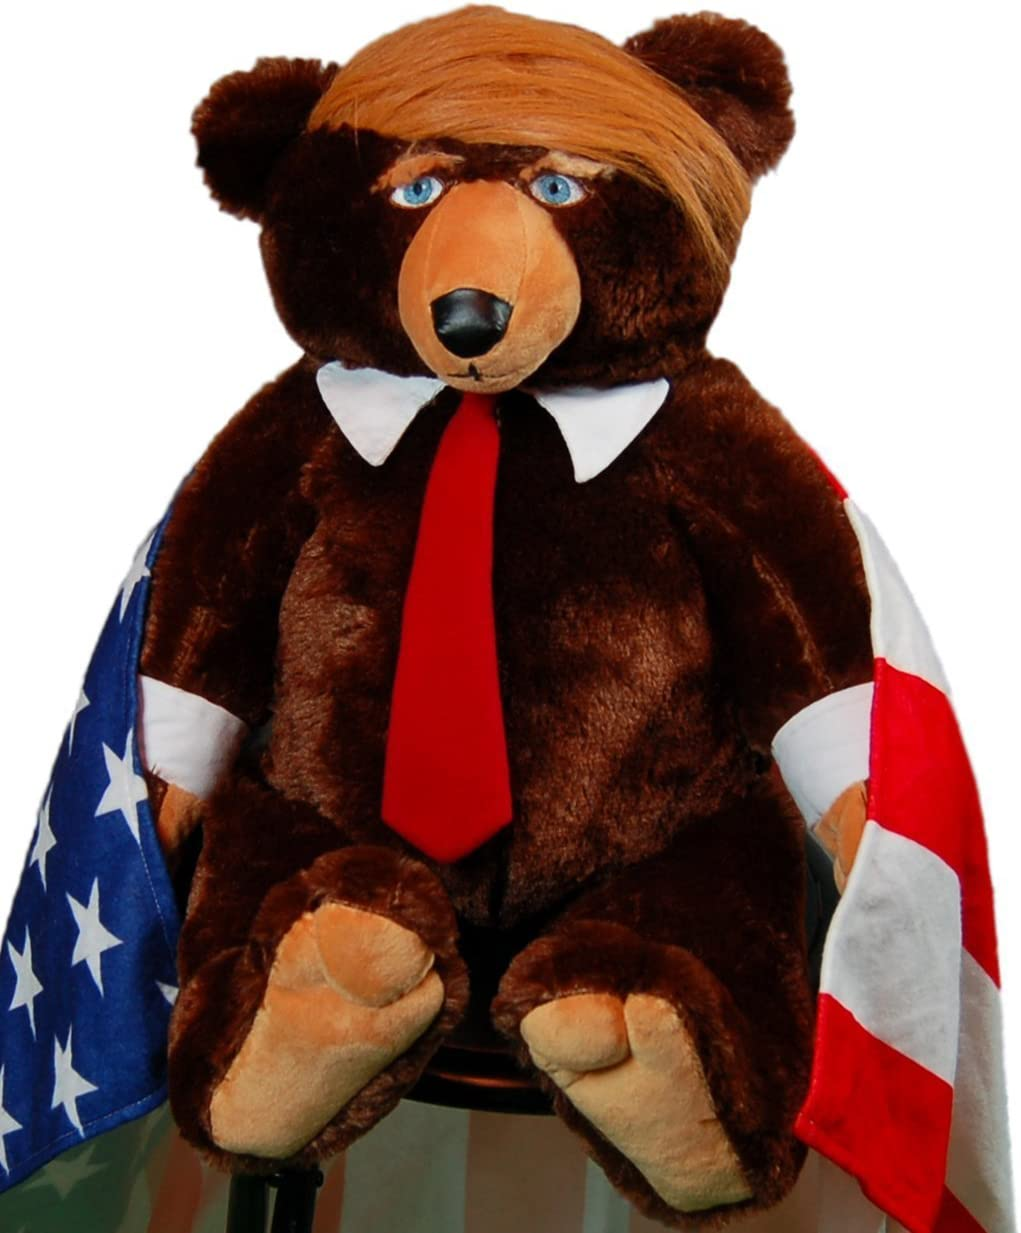 Amazon.com: Trumpy Bear: Toys & Games